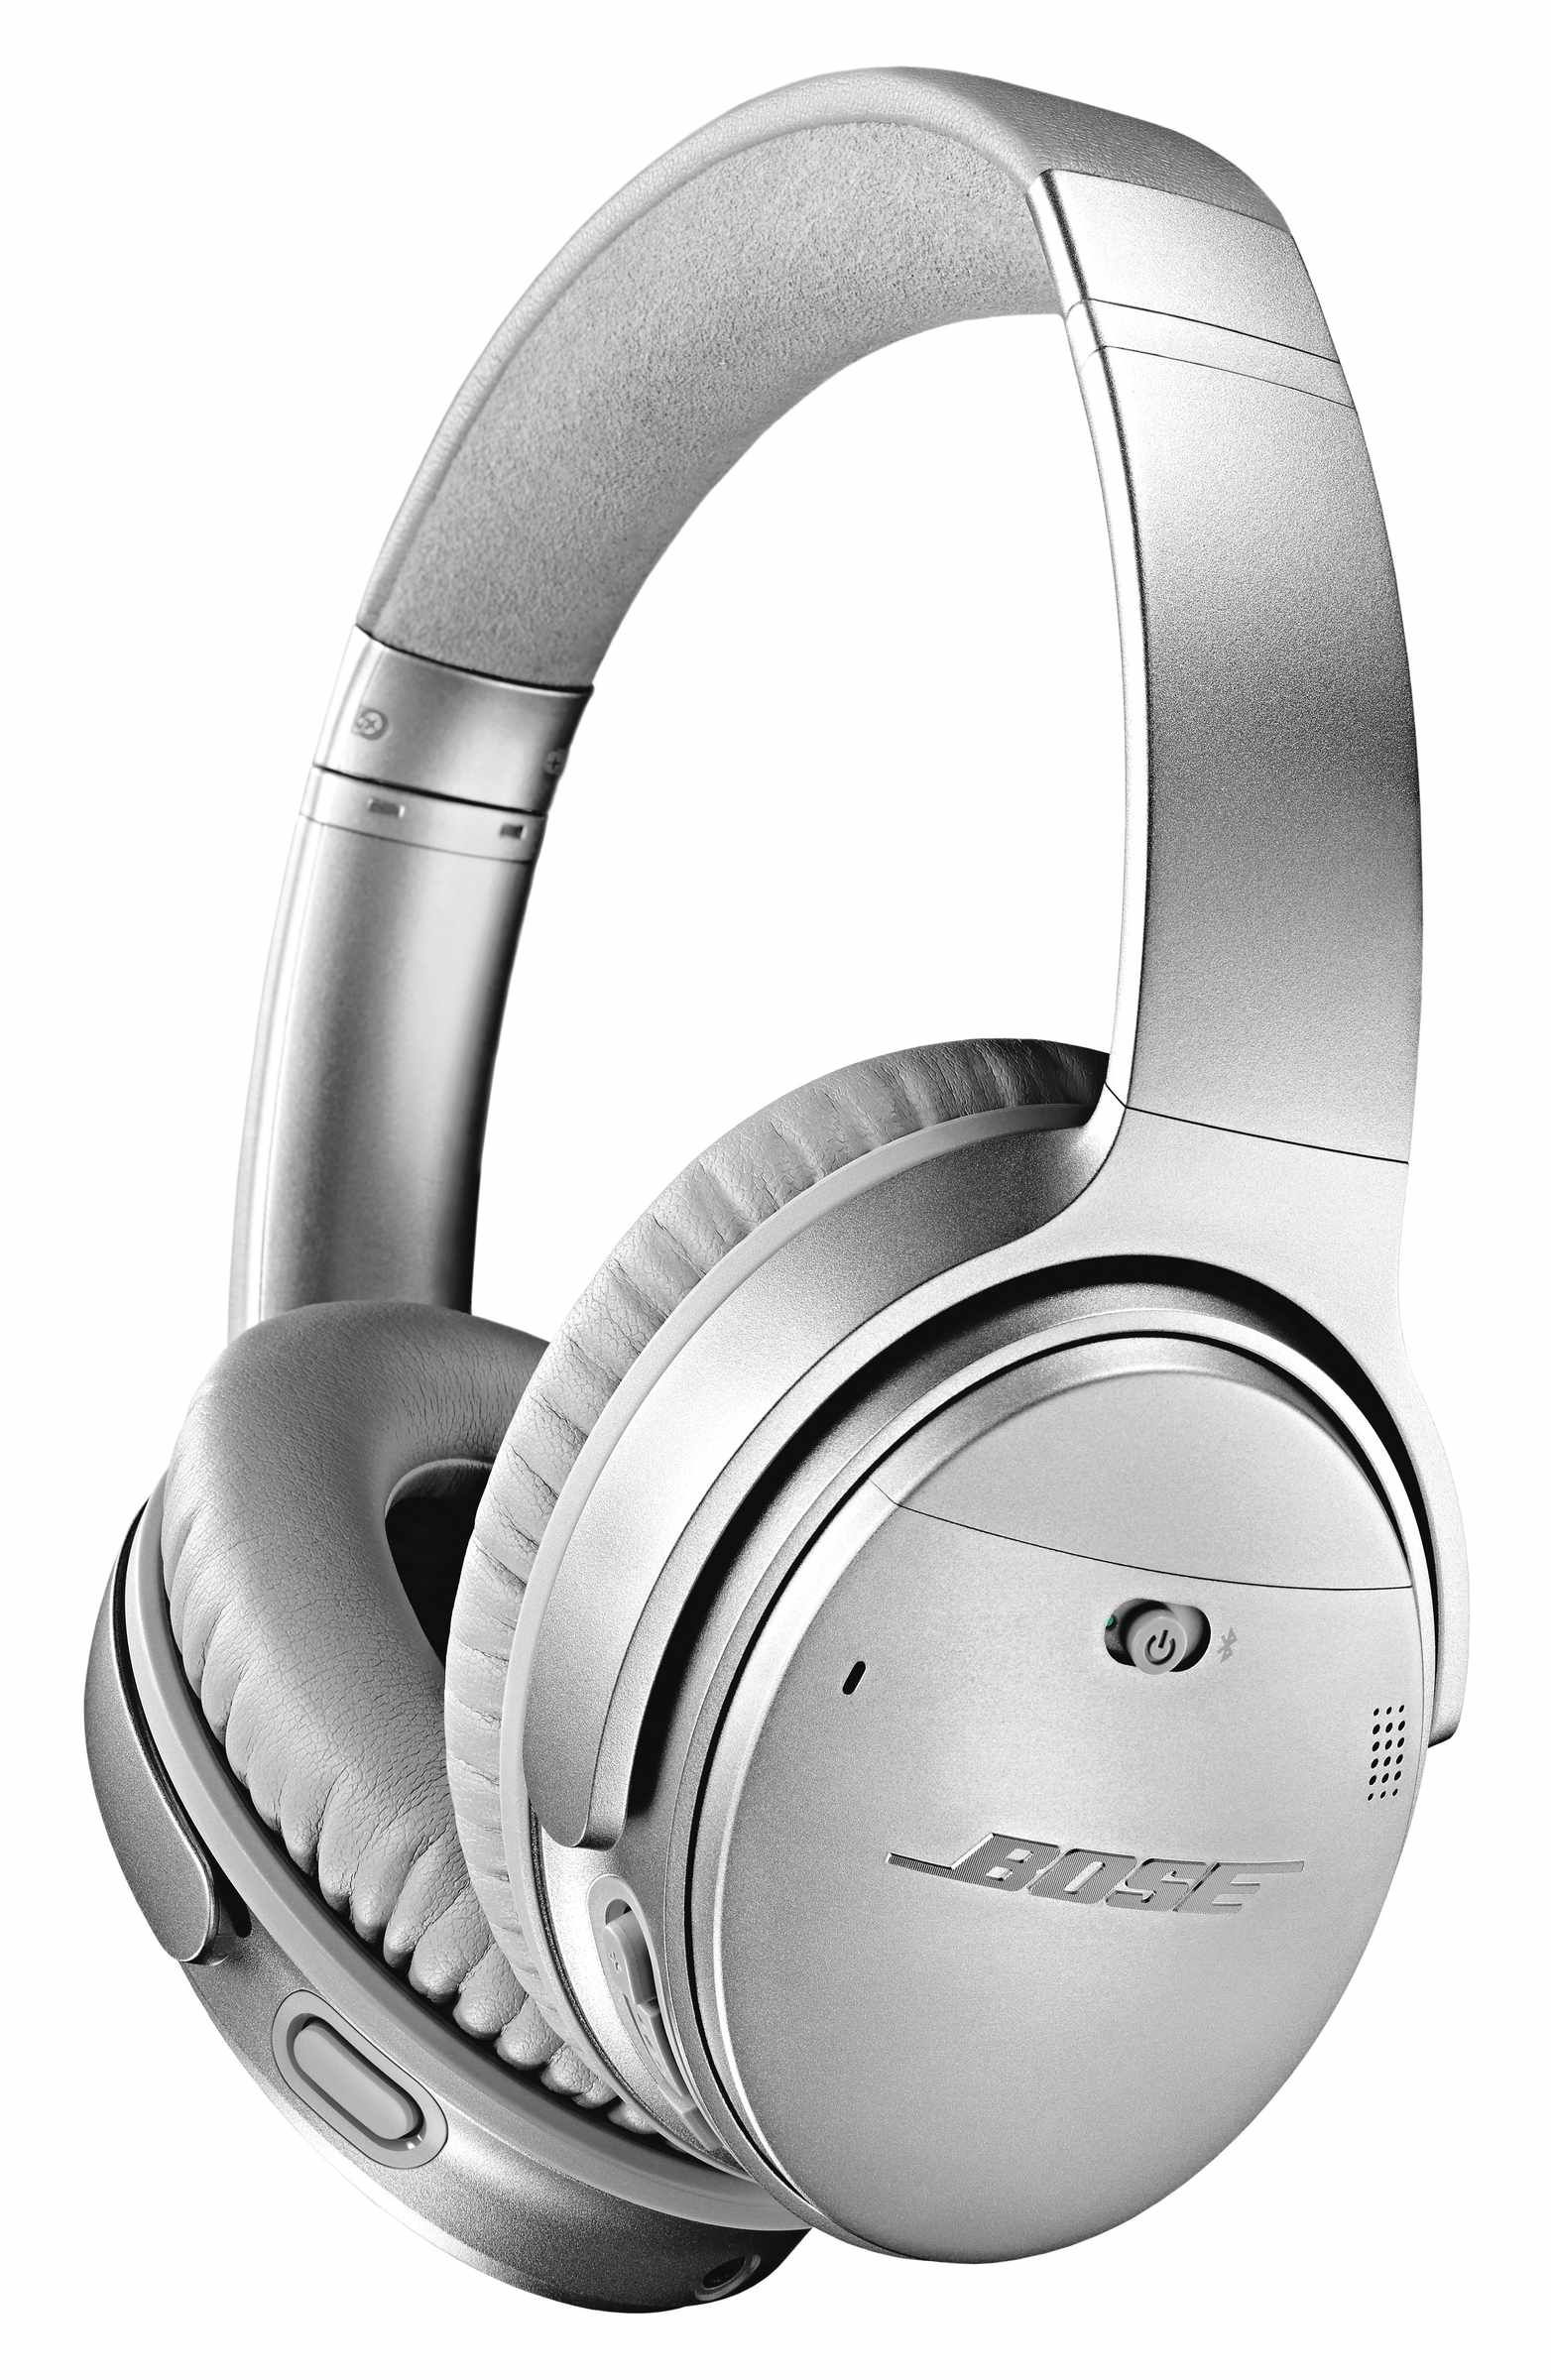 Bose Quietcomfort 35 Wireless Over Ear Headphones Ii With Google Assistant With Images Bose Headphones Wireless Noise Cancelling Headphones Wireless Headphones